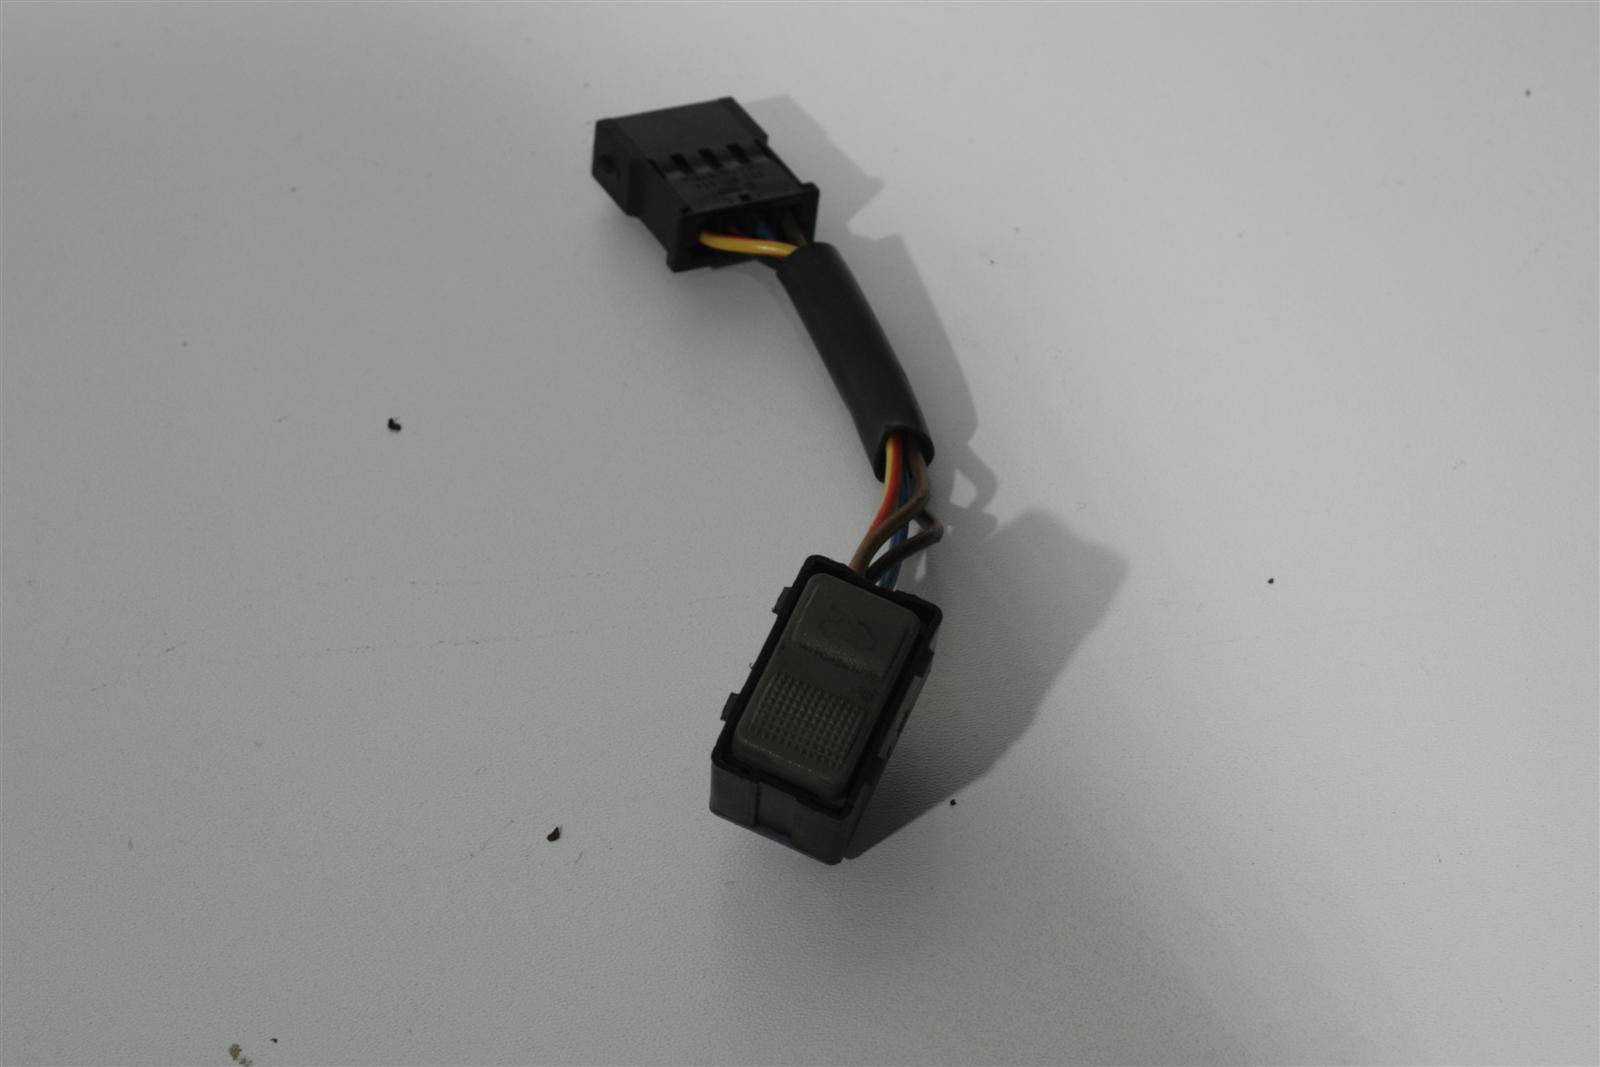 Audi V8 D11 Schiebedachschalter grau 441959561